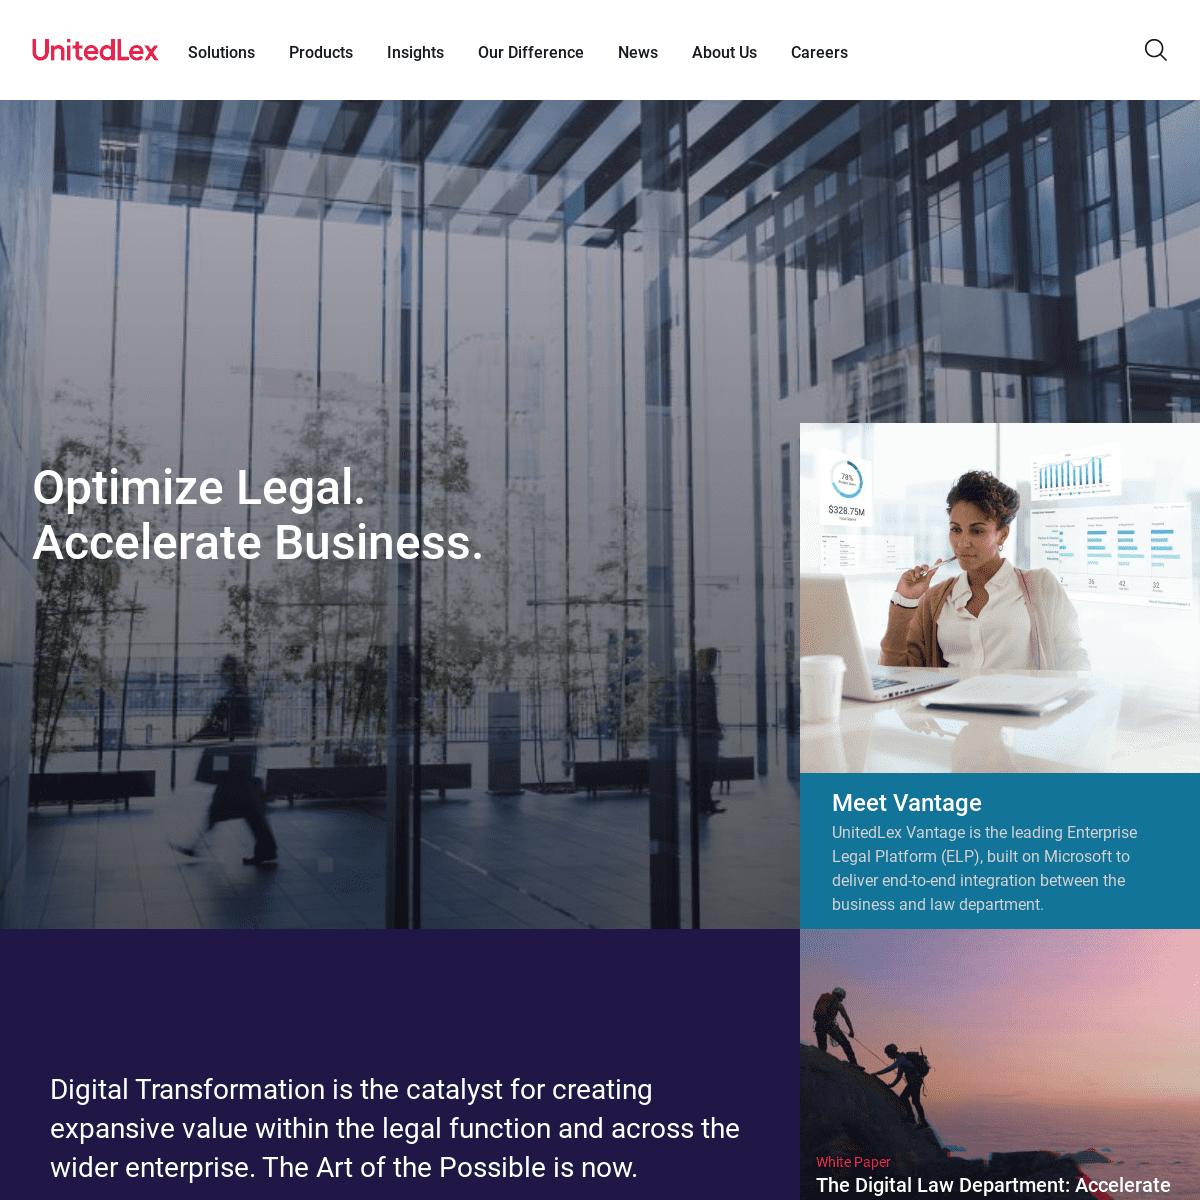 Optimize Legal. Accelerate Business. - UnitedLex